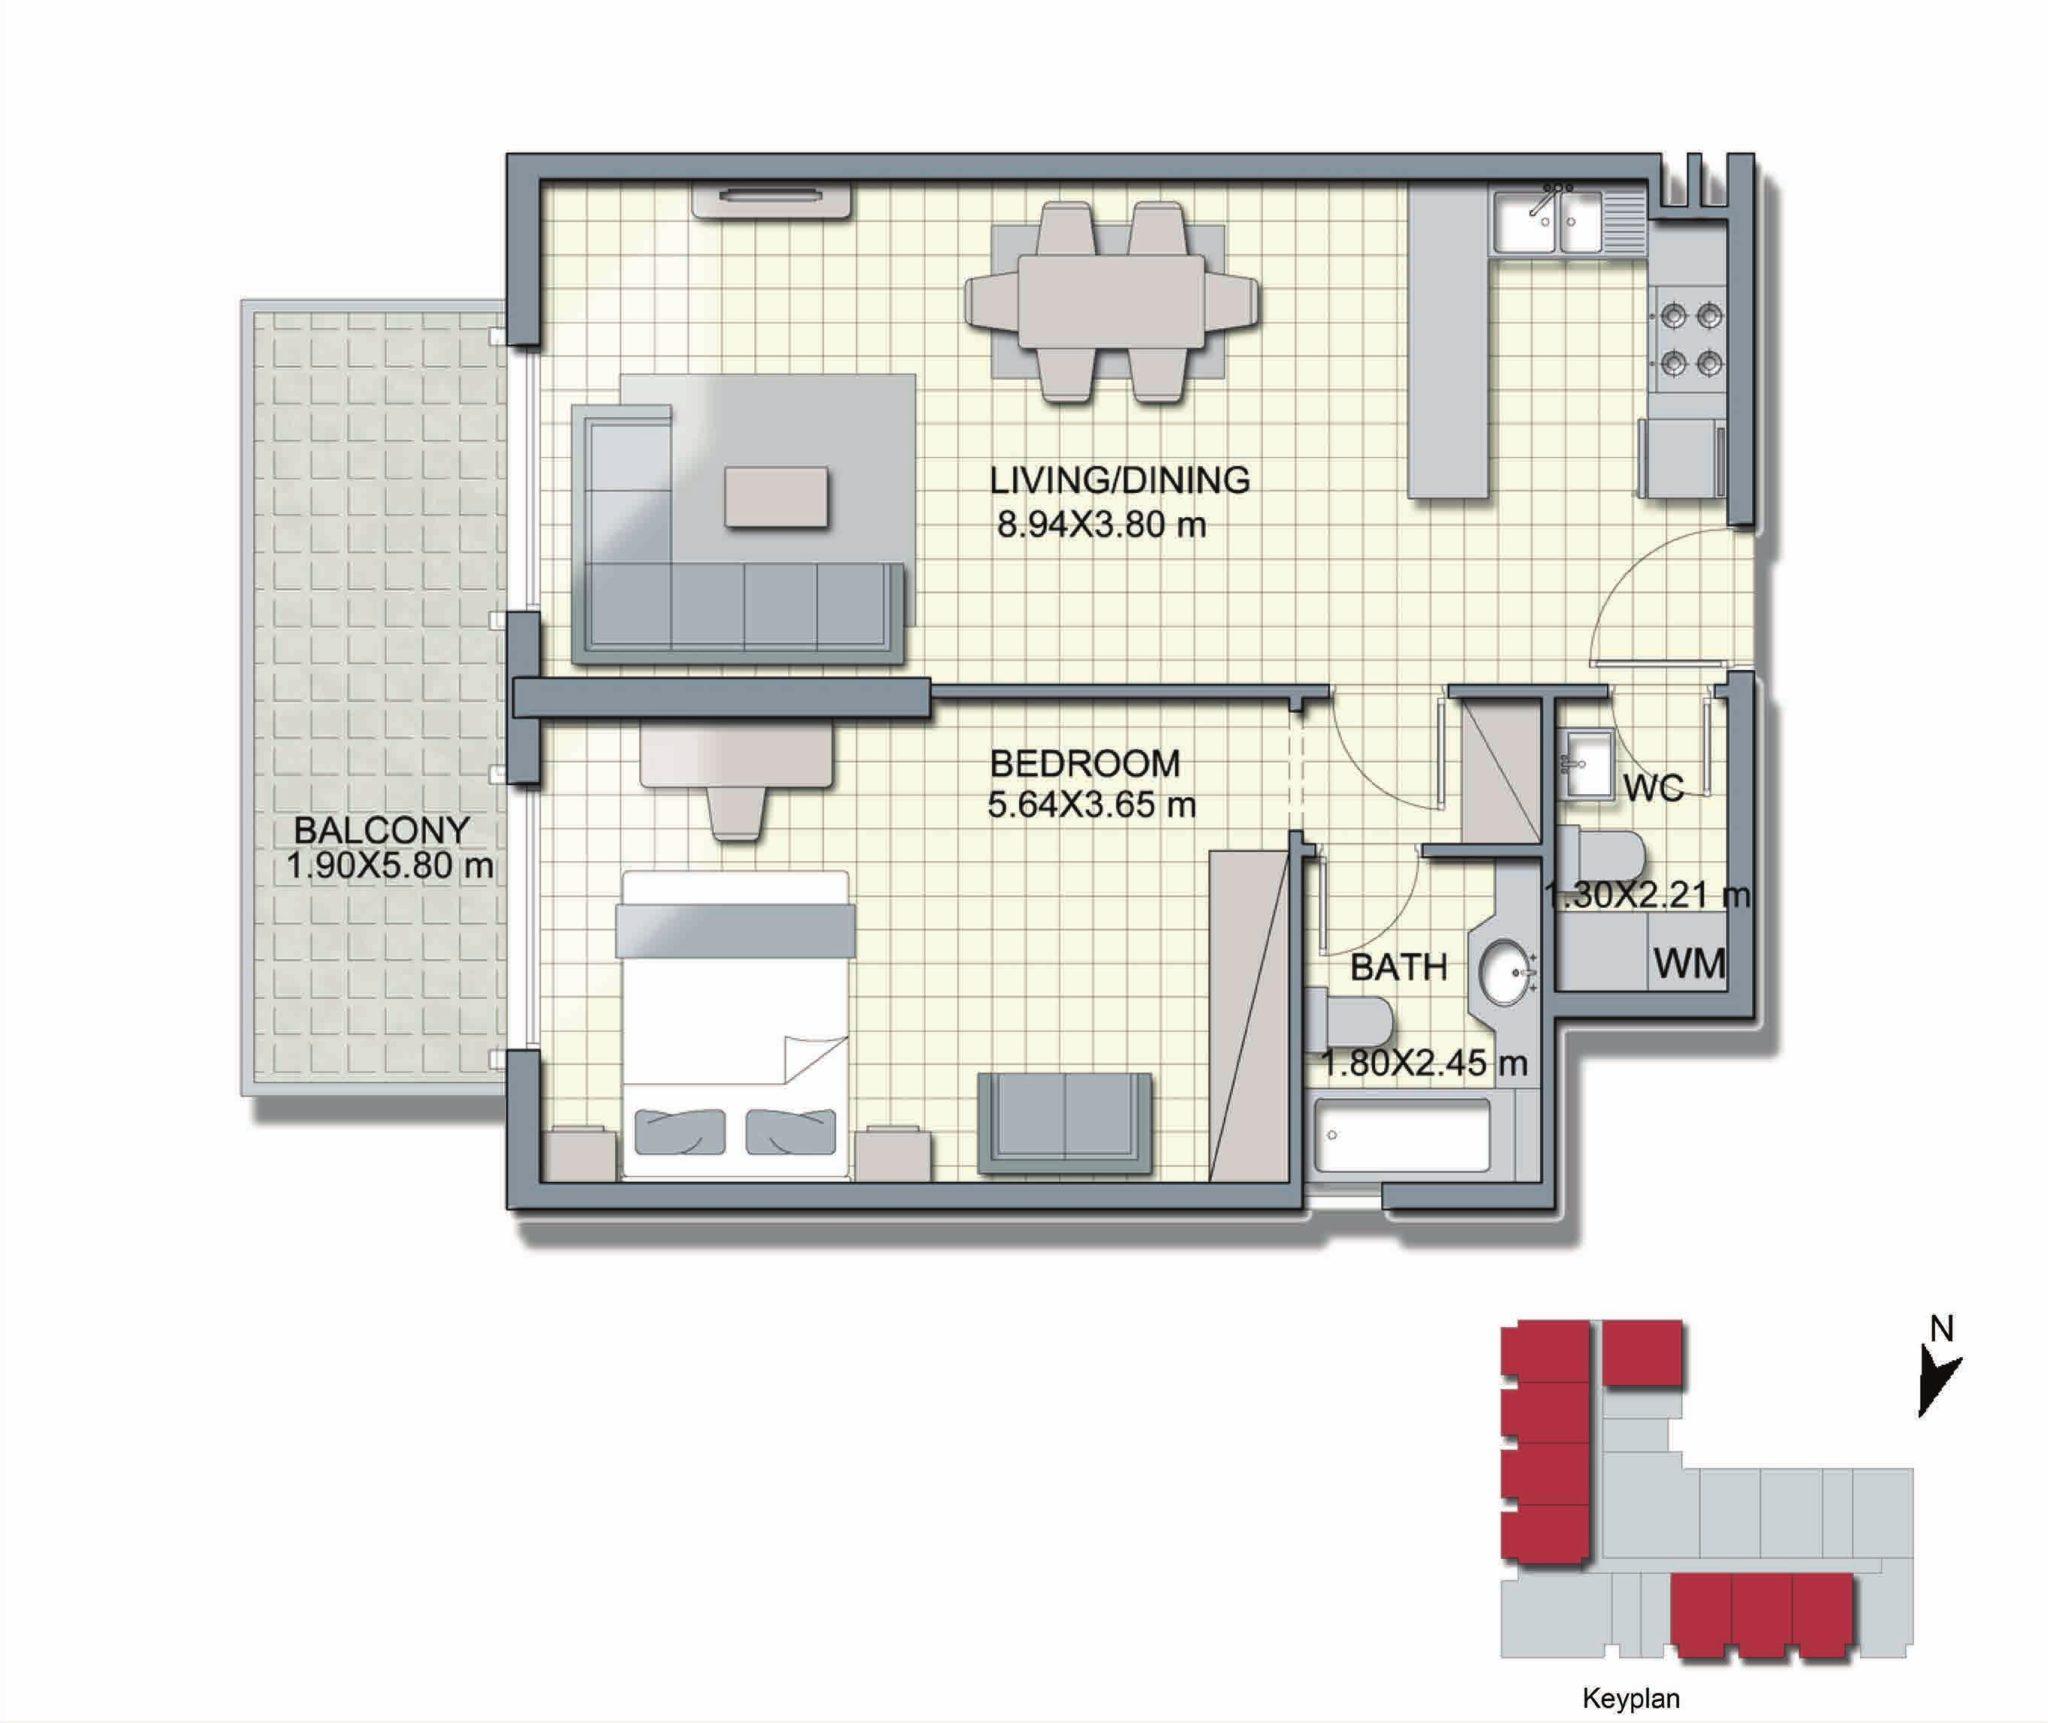 1 Bedroom - A1